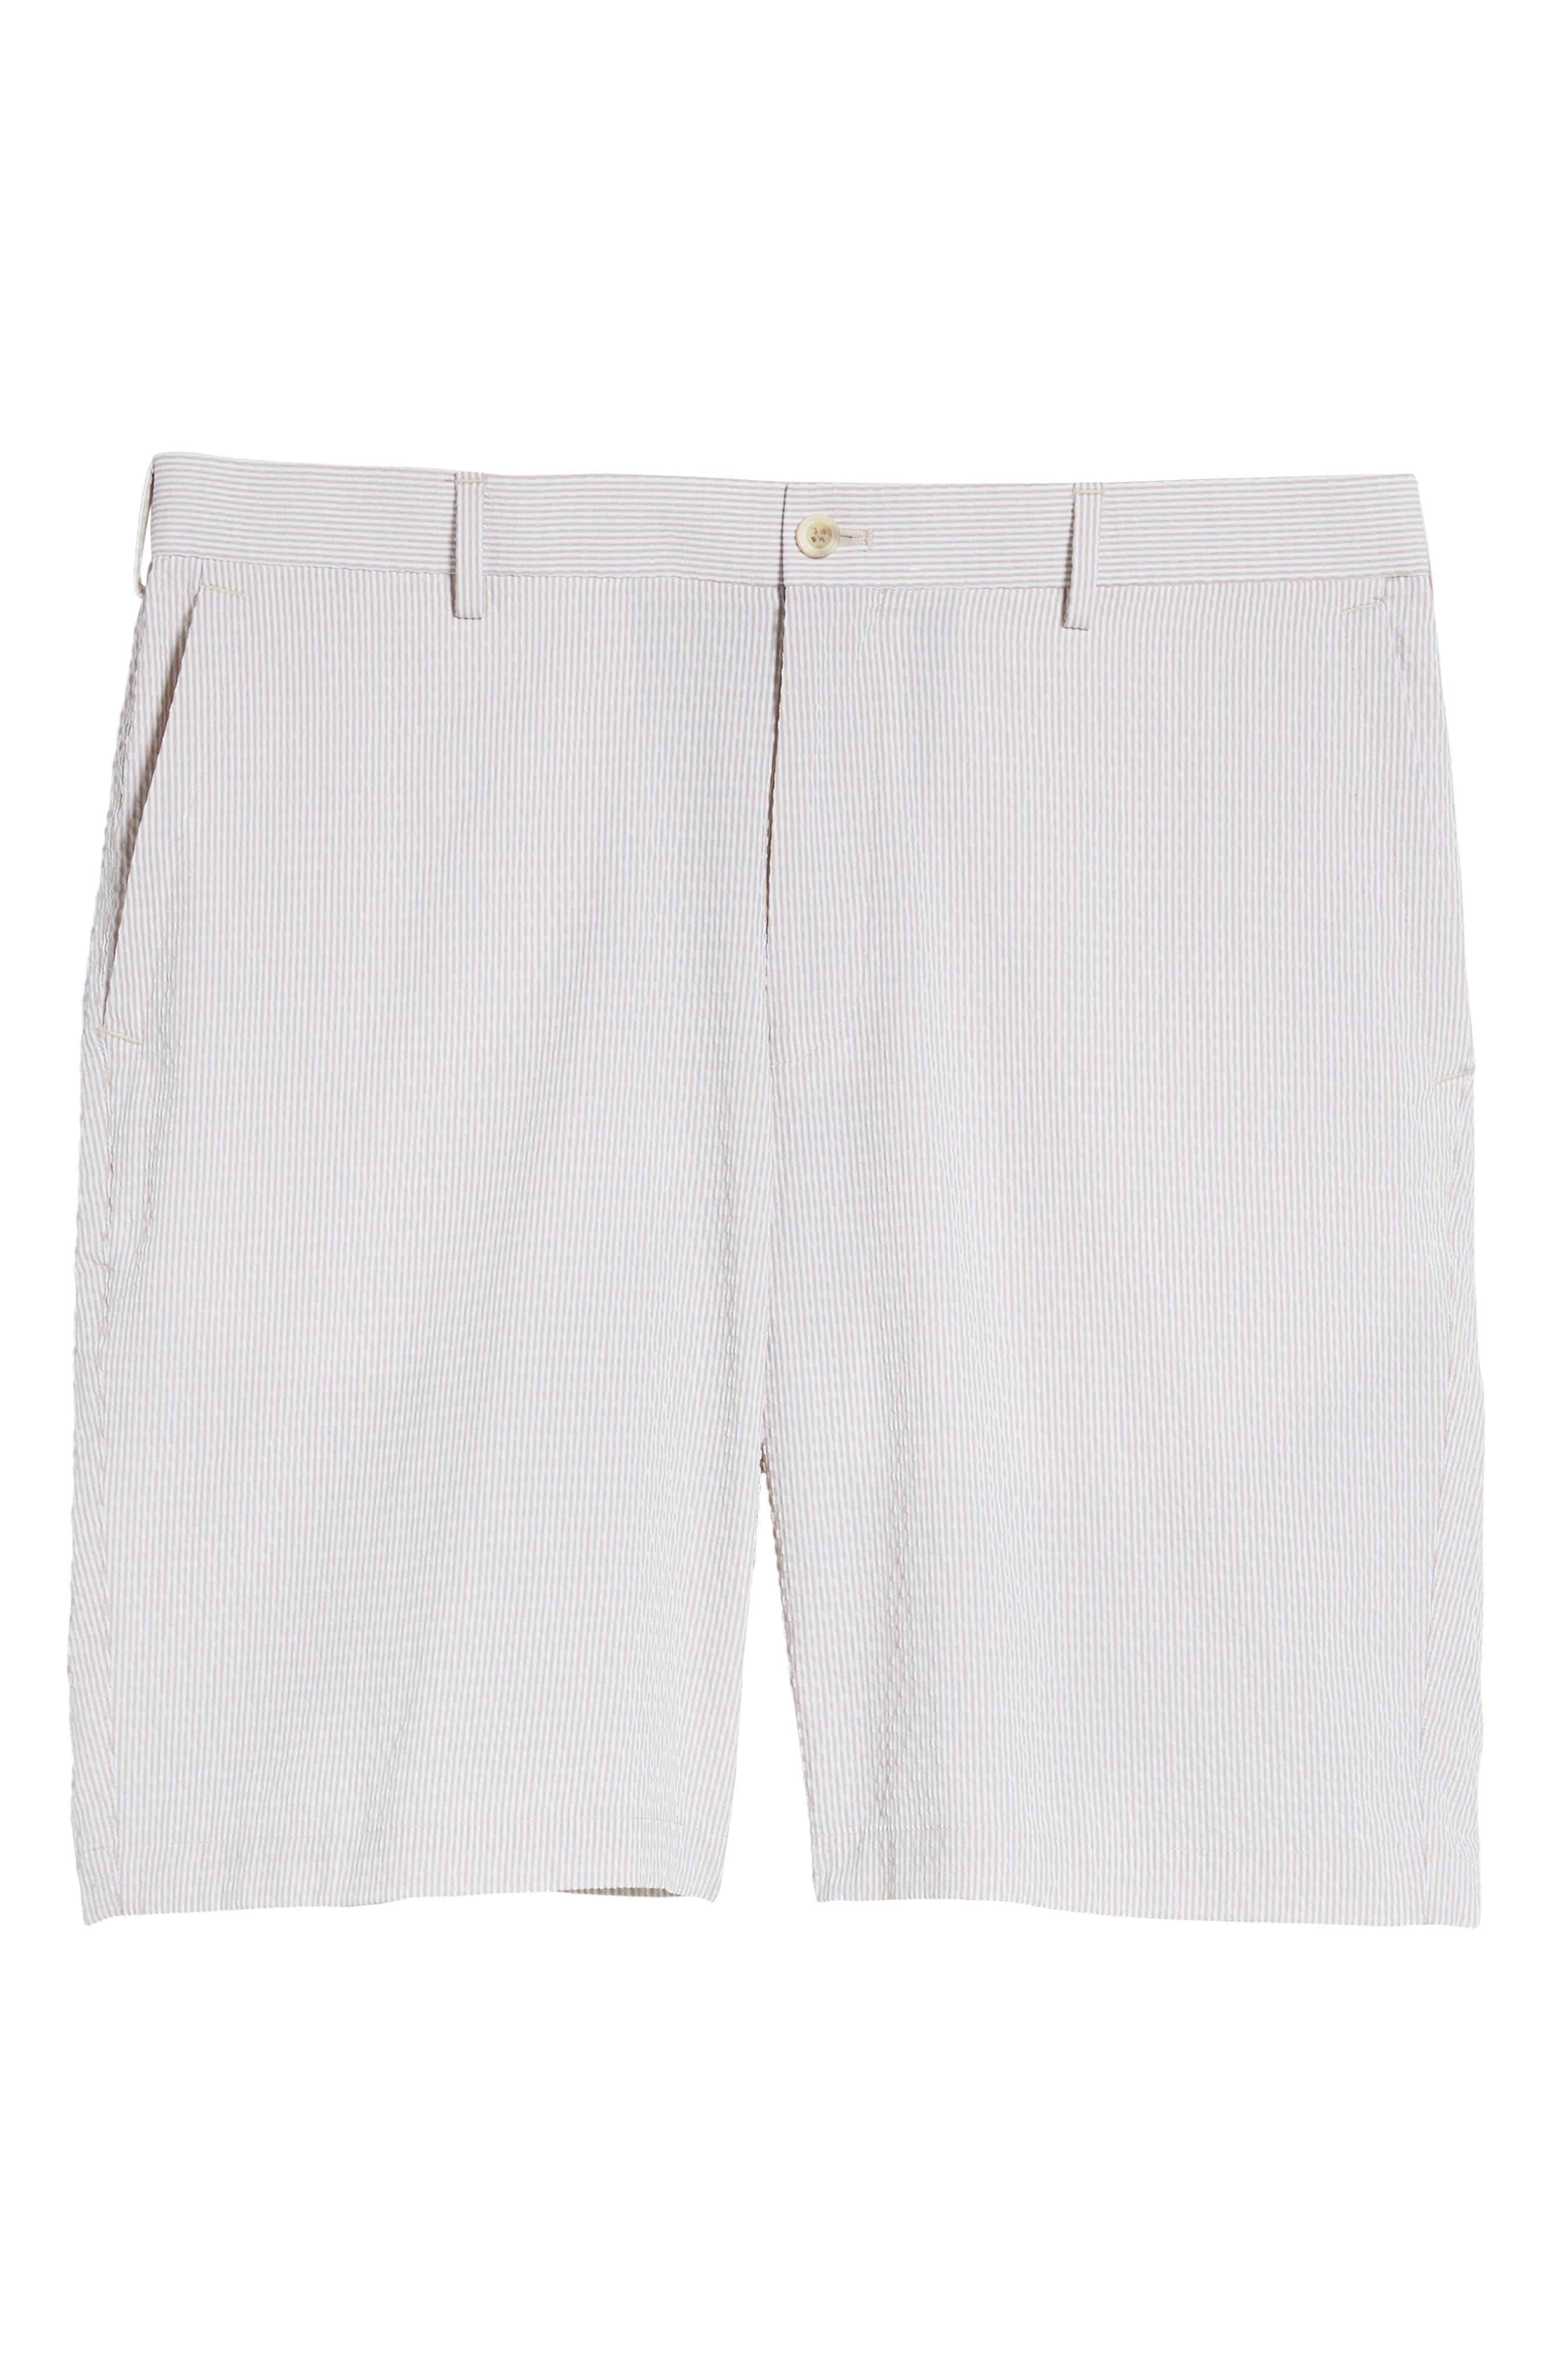 Apex Pinstripe Seersucker Shorts,                             Alternate thumbnail 6, color,                             260